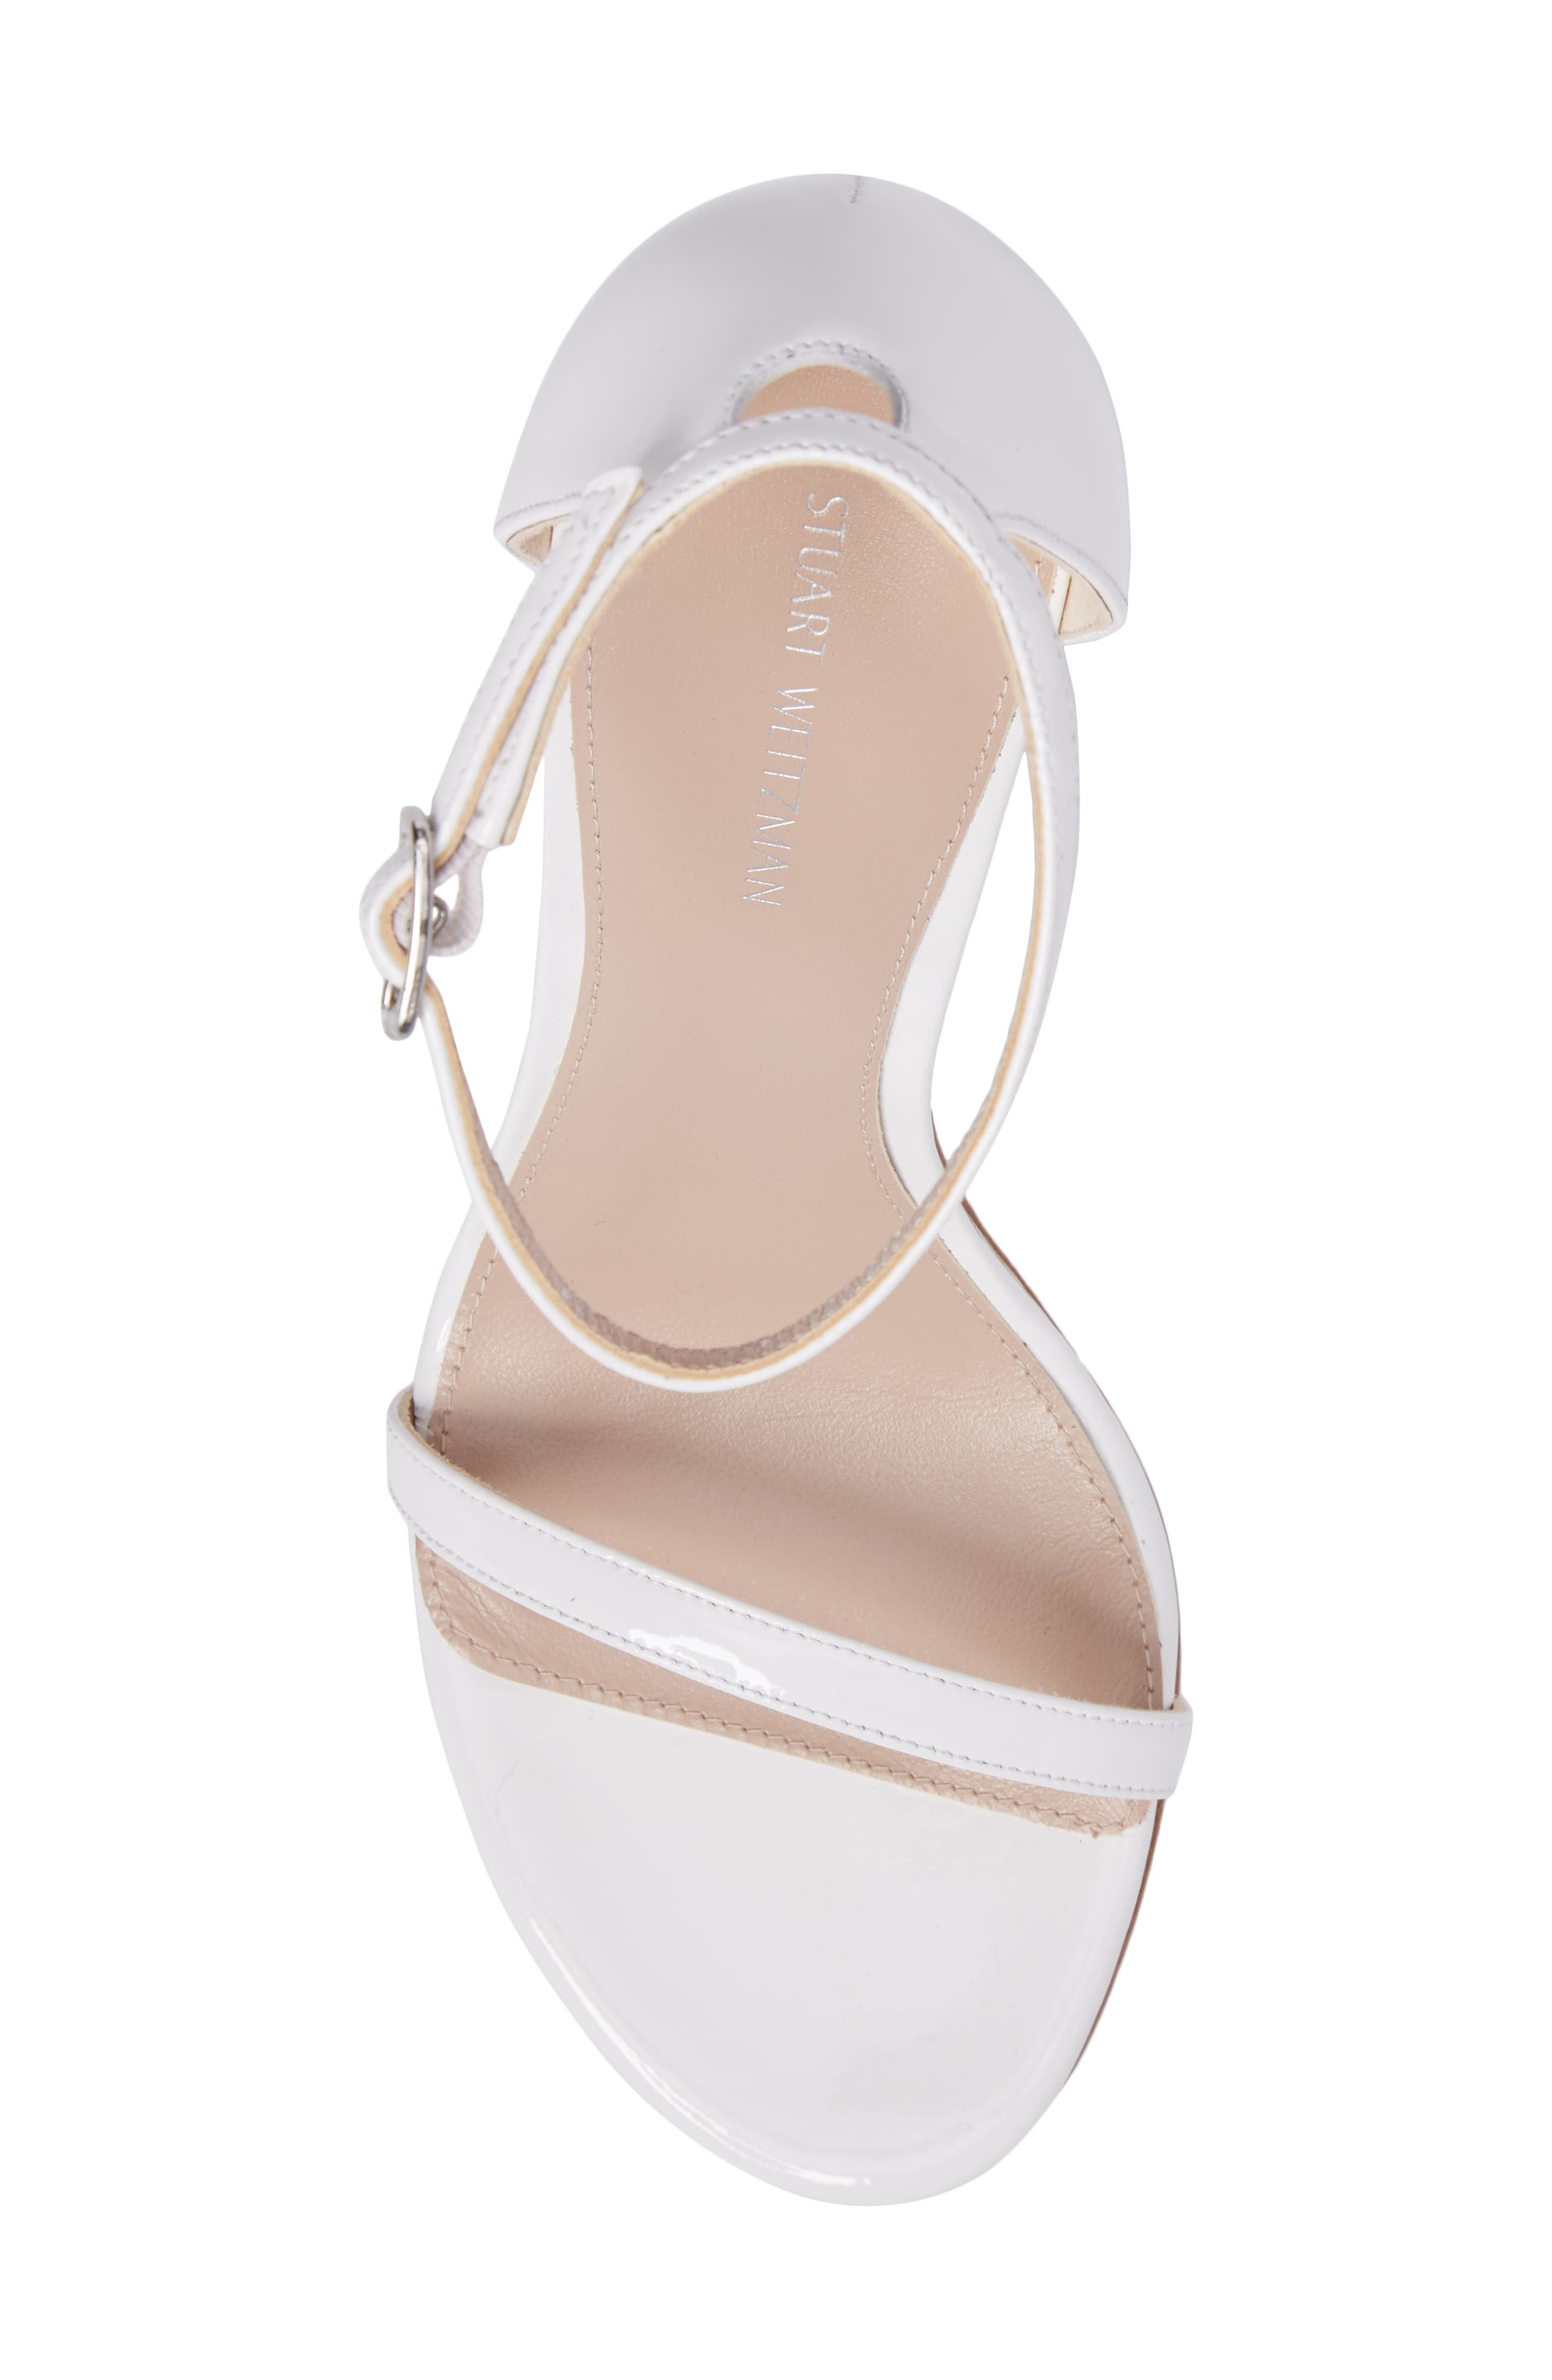 Nudistsong Ankle Strap Sandal,                             Alternate thumbnail 172, color,